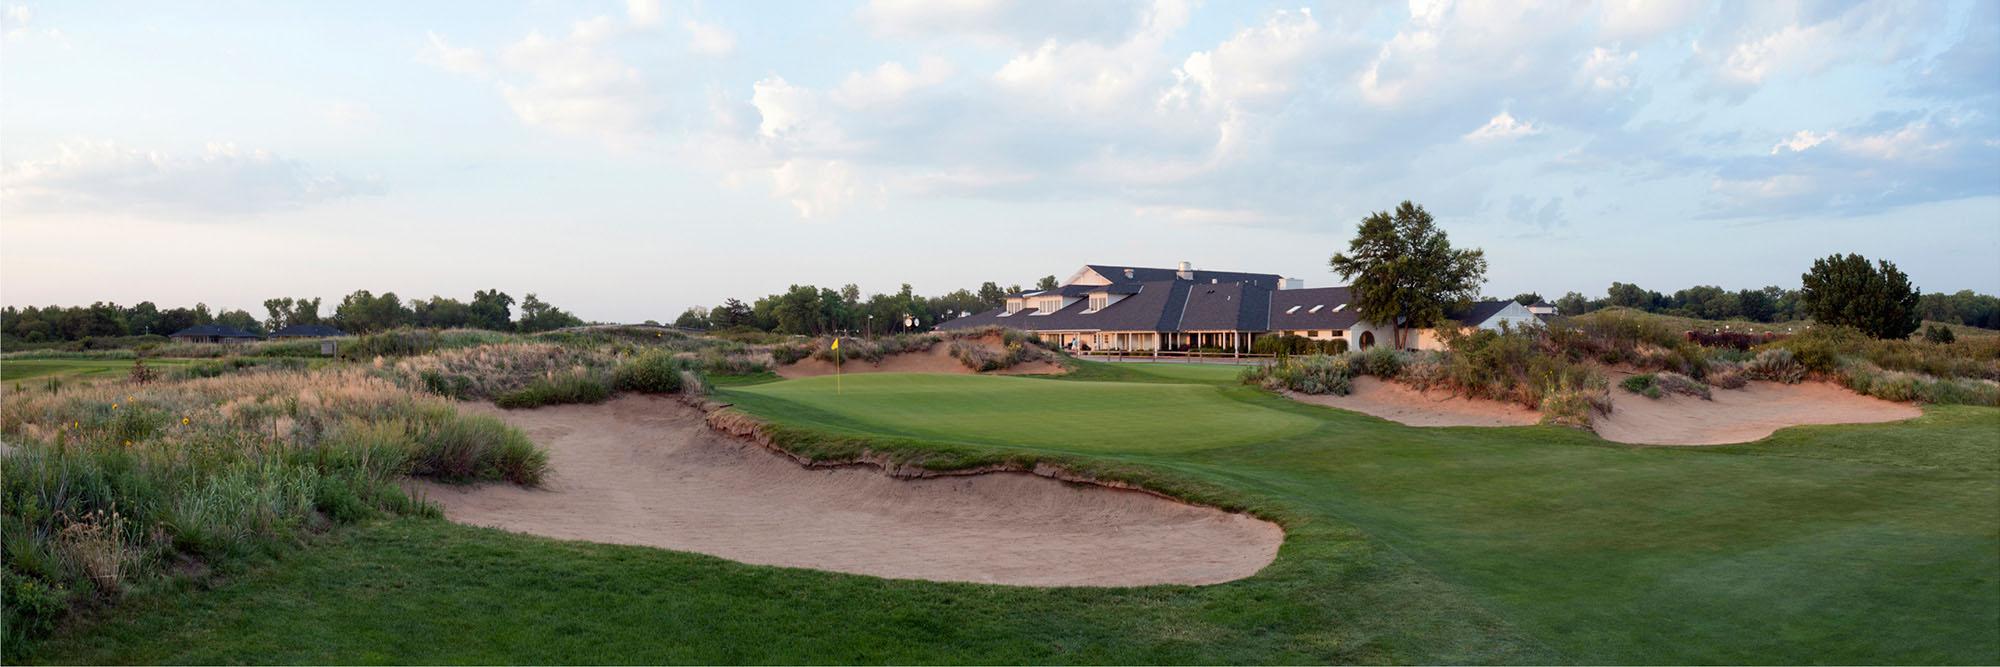 Golf Course Image - Prairie Dunes Country Club No. 7